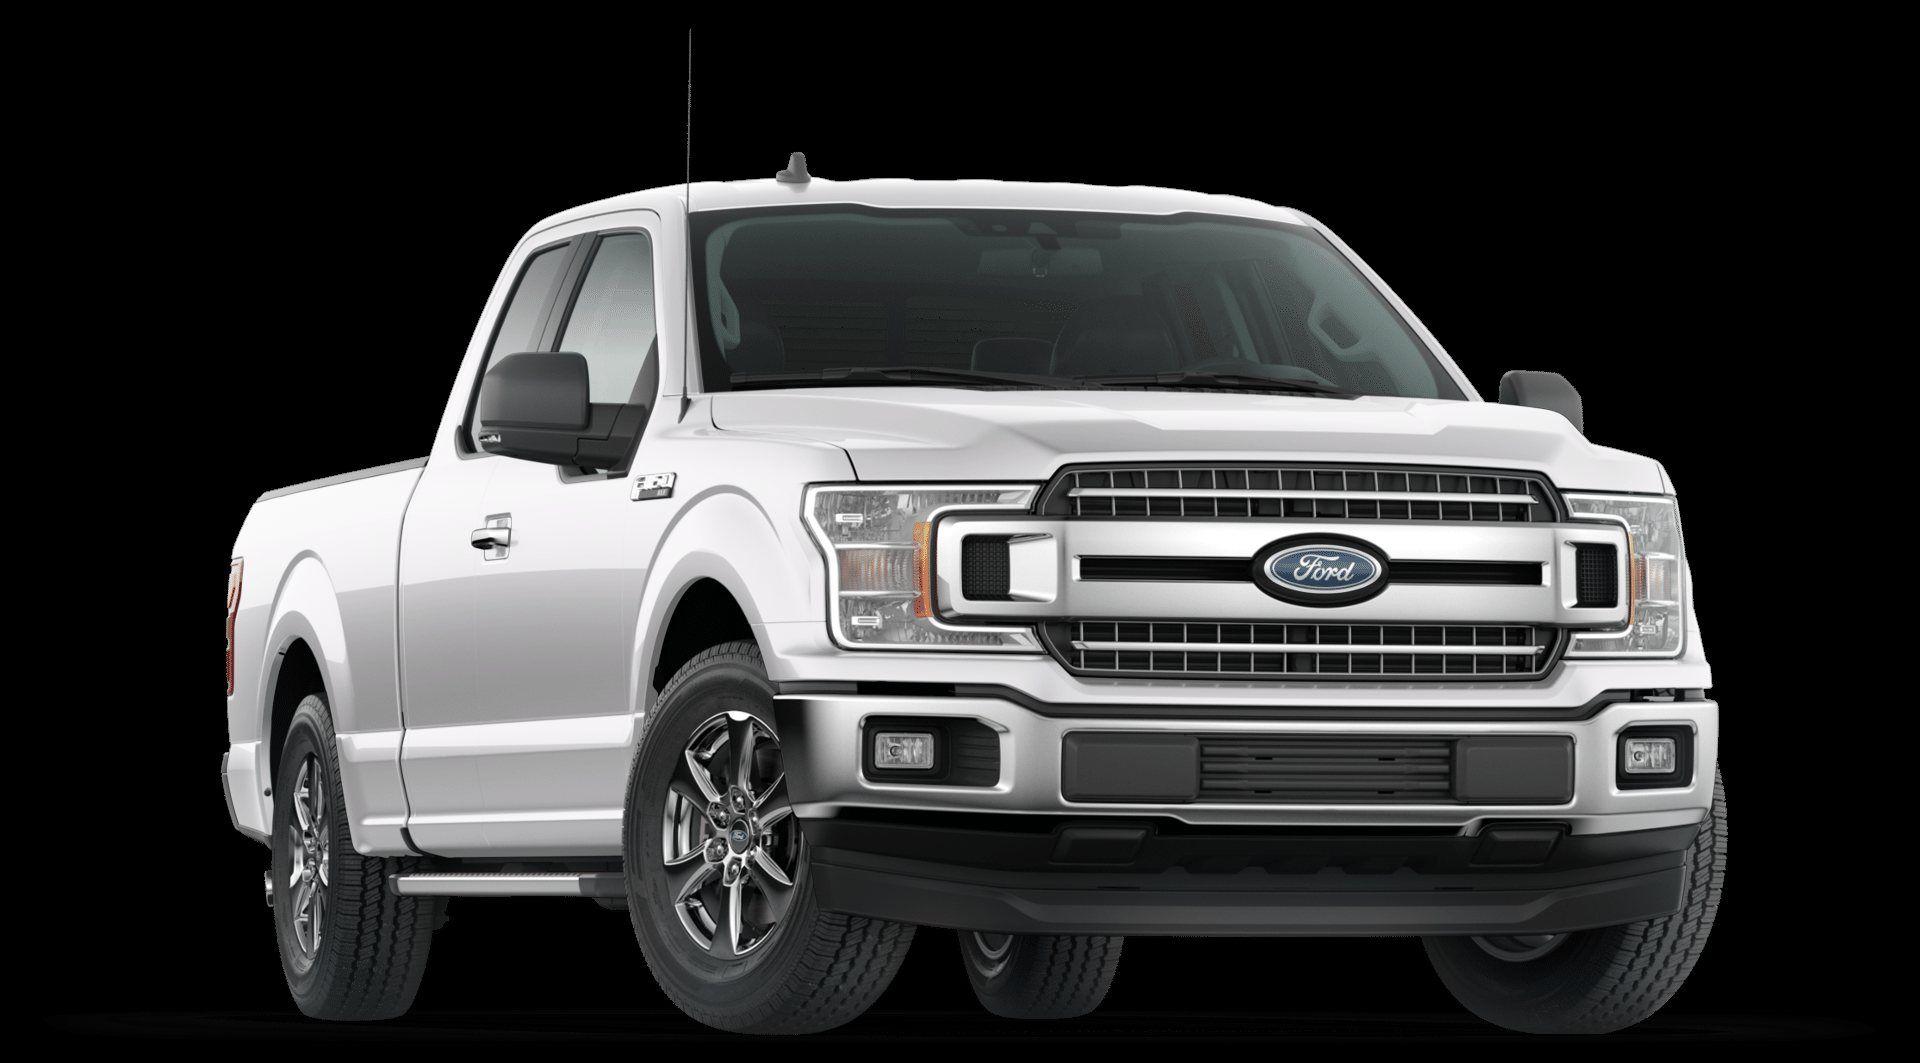 2021 Ford Lightning Svt Redesign and Concept